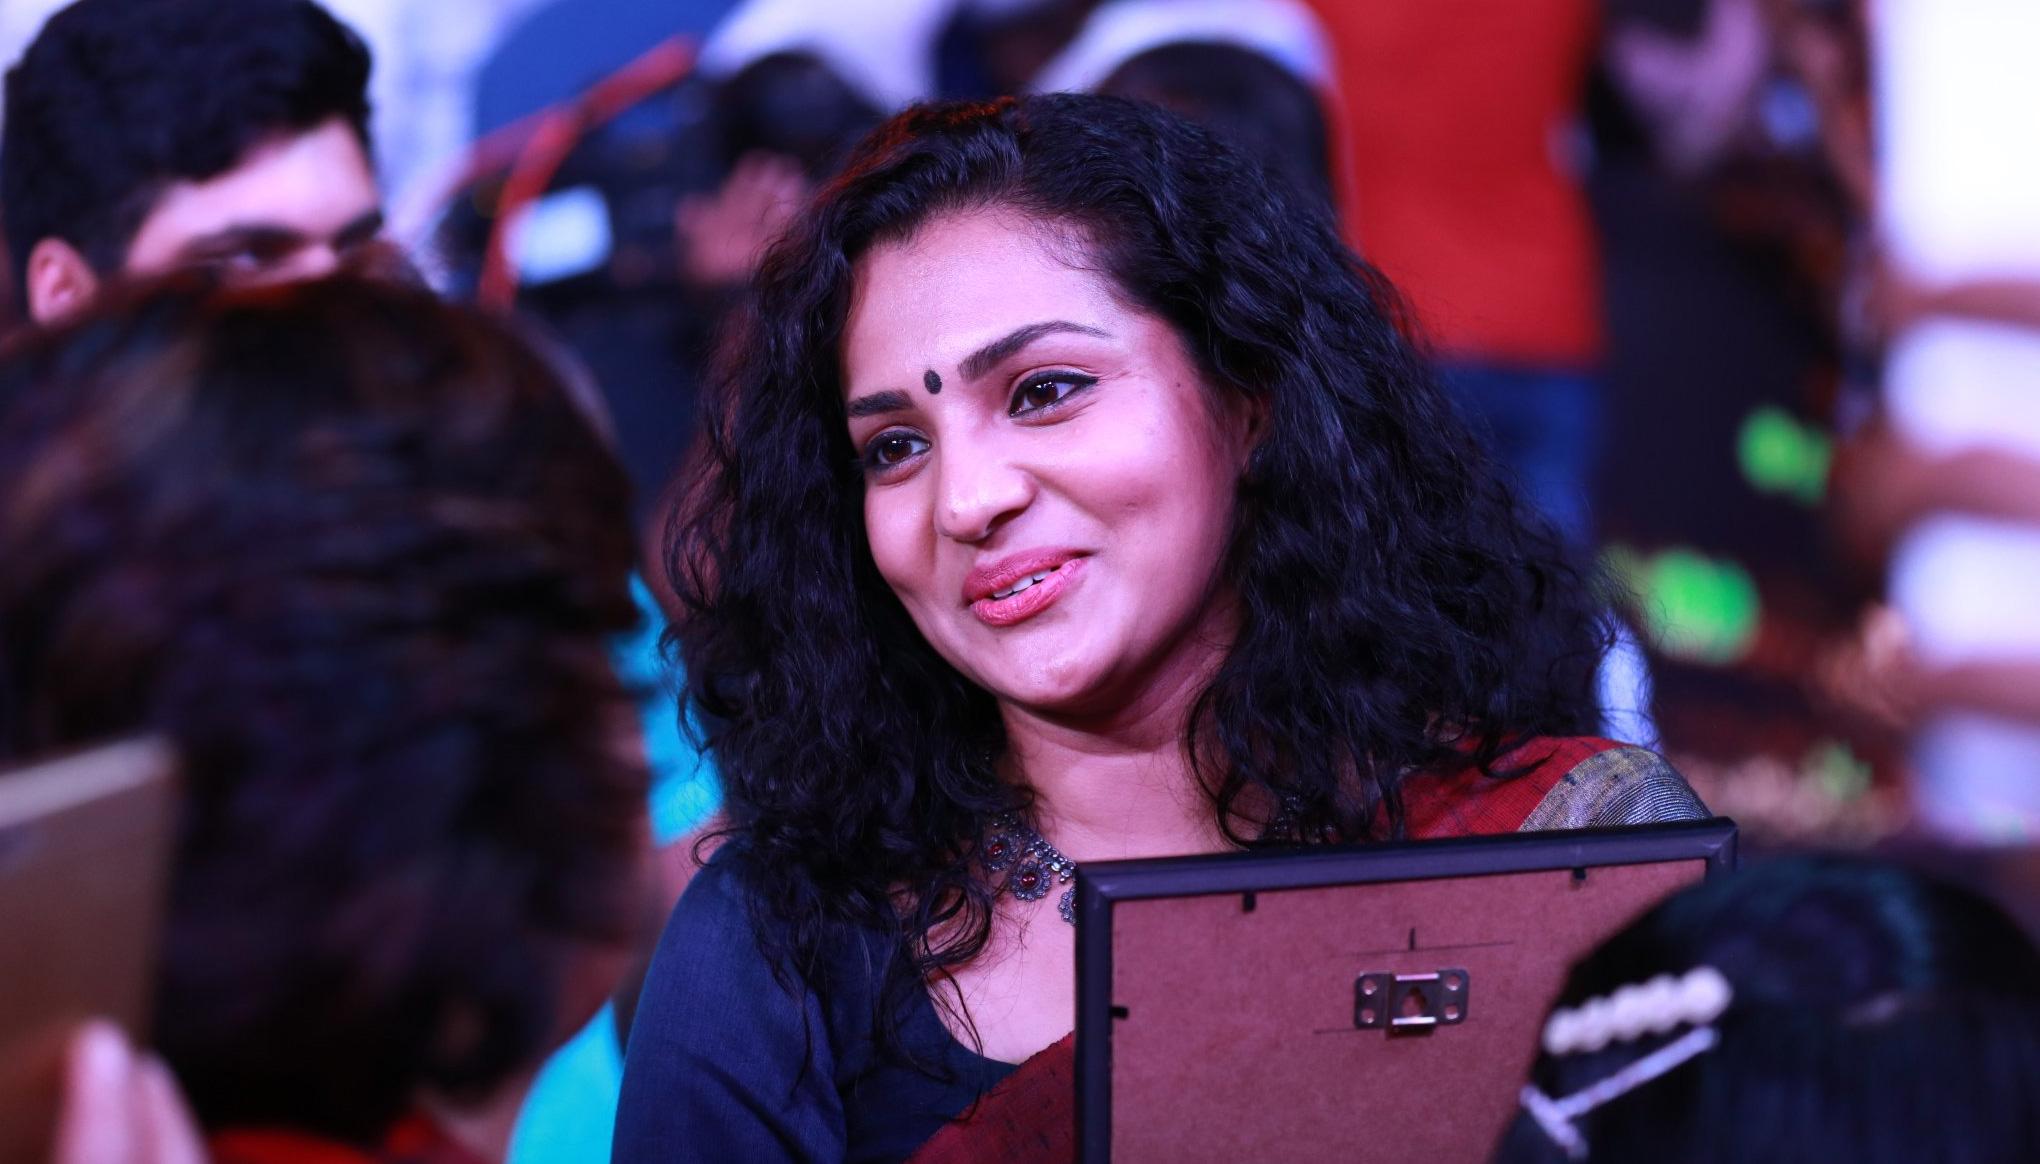 आईएफएफआई 2017 का खुशनुमा अंत, अभिनेत्री पार्वती ने बेस्ट एक्ट्रेस अवार्ड पर जमाया कब्जा